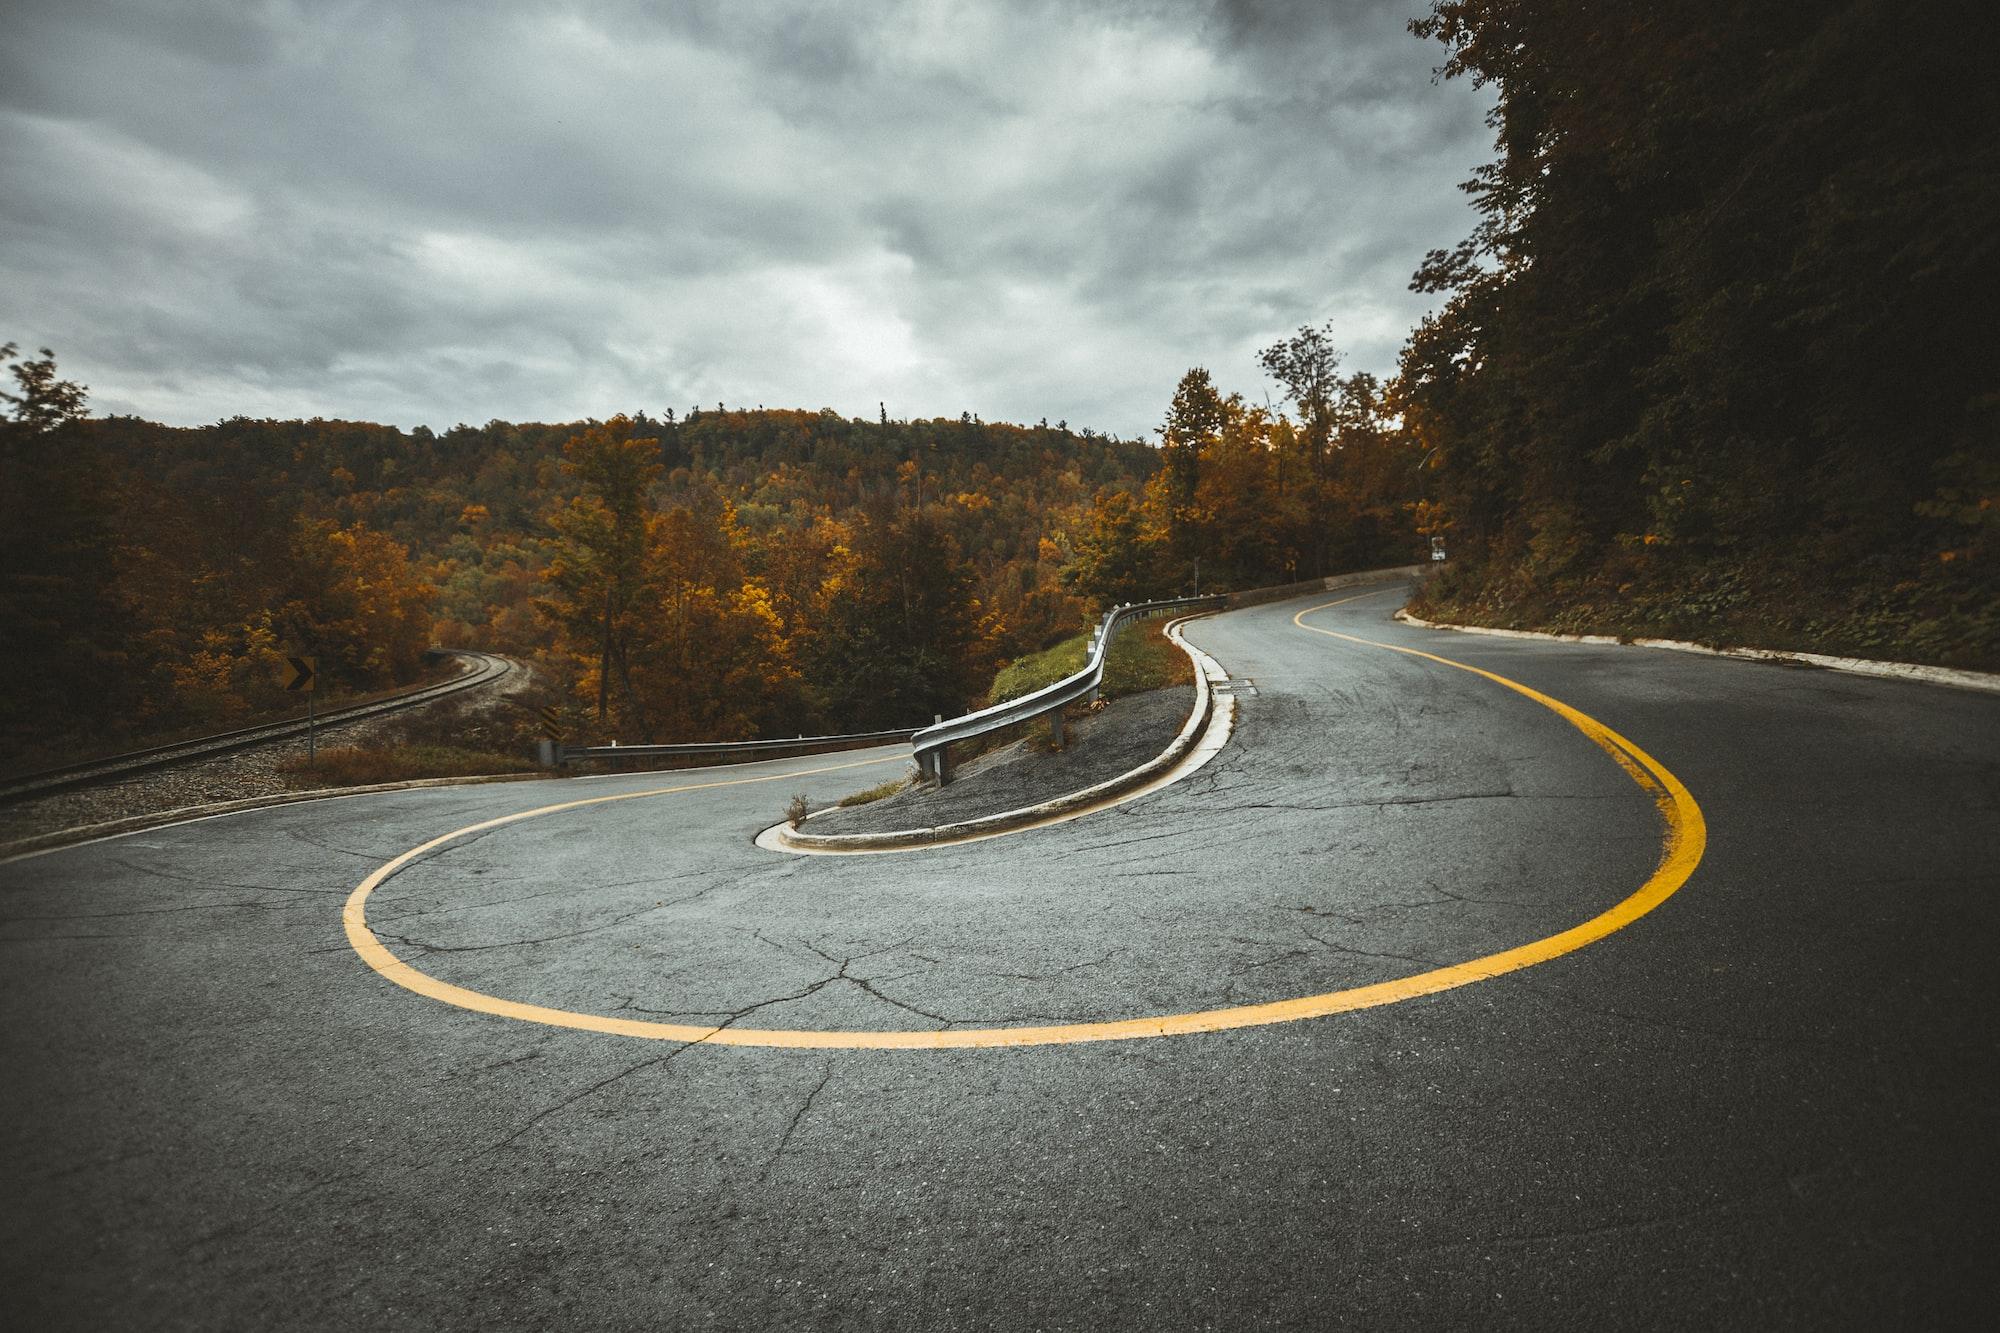 Taking a wrong turn